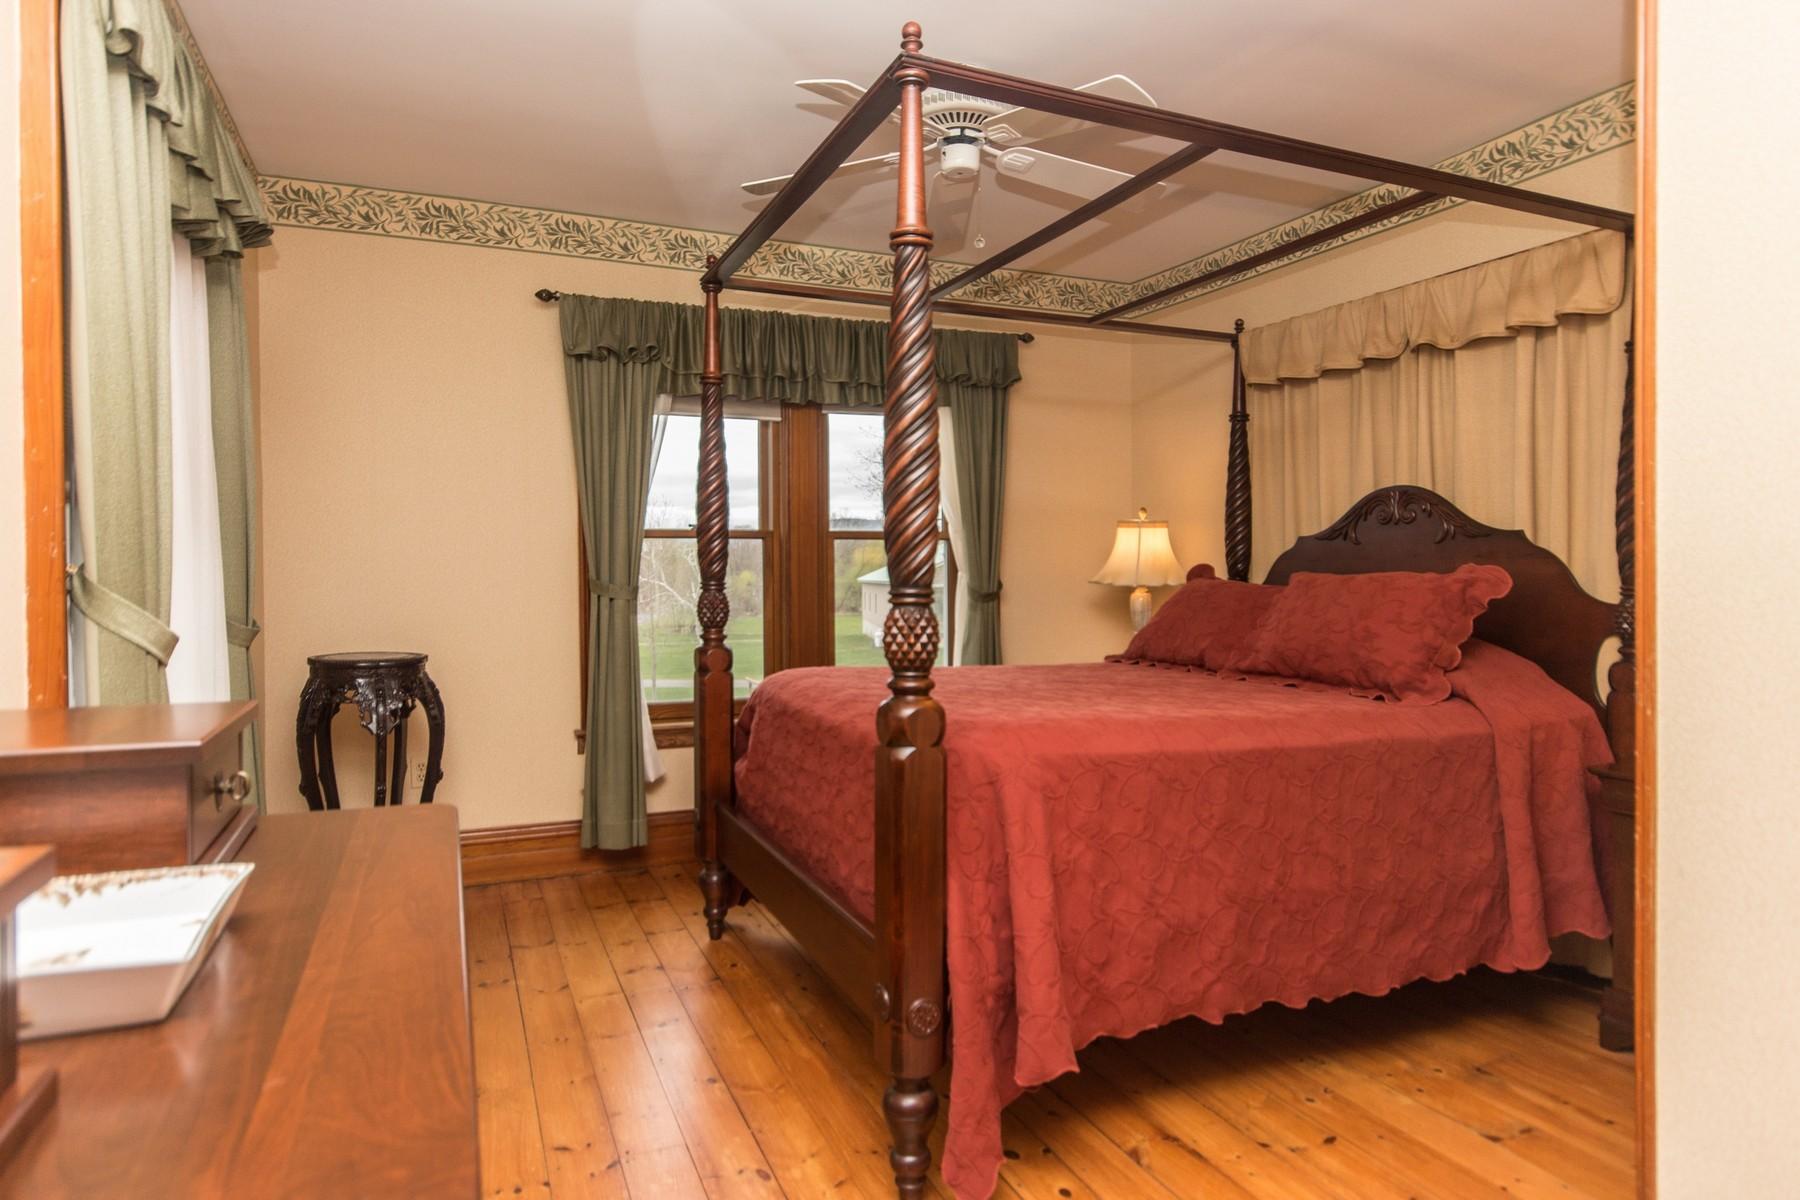 Additional photo for property listing at The Cambridge Farm 3  Perry La 坎布里奇, 纽约州 12816 美国